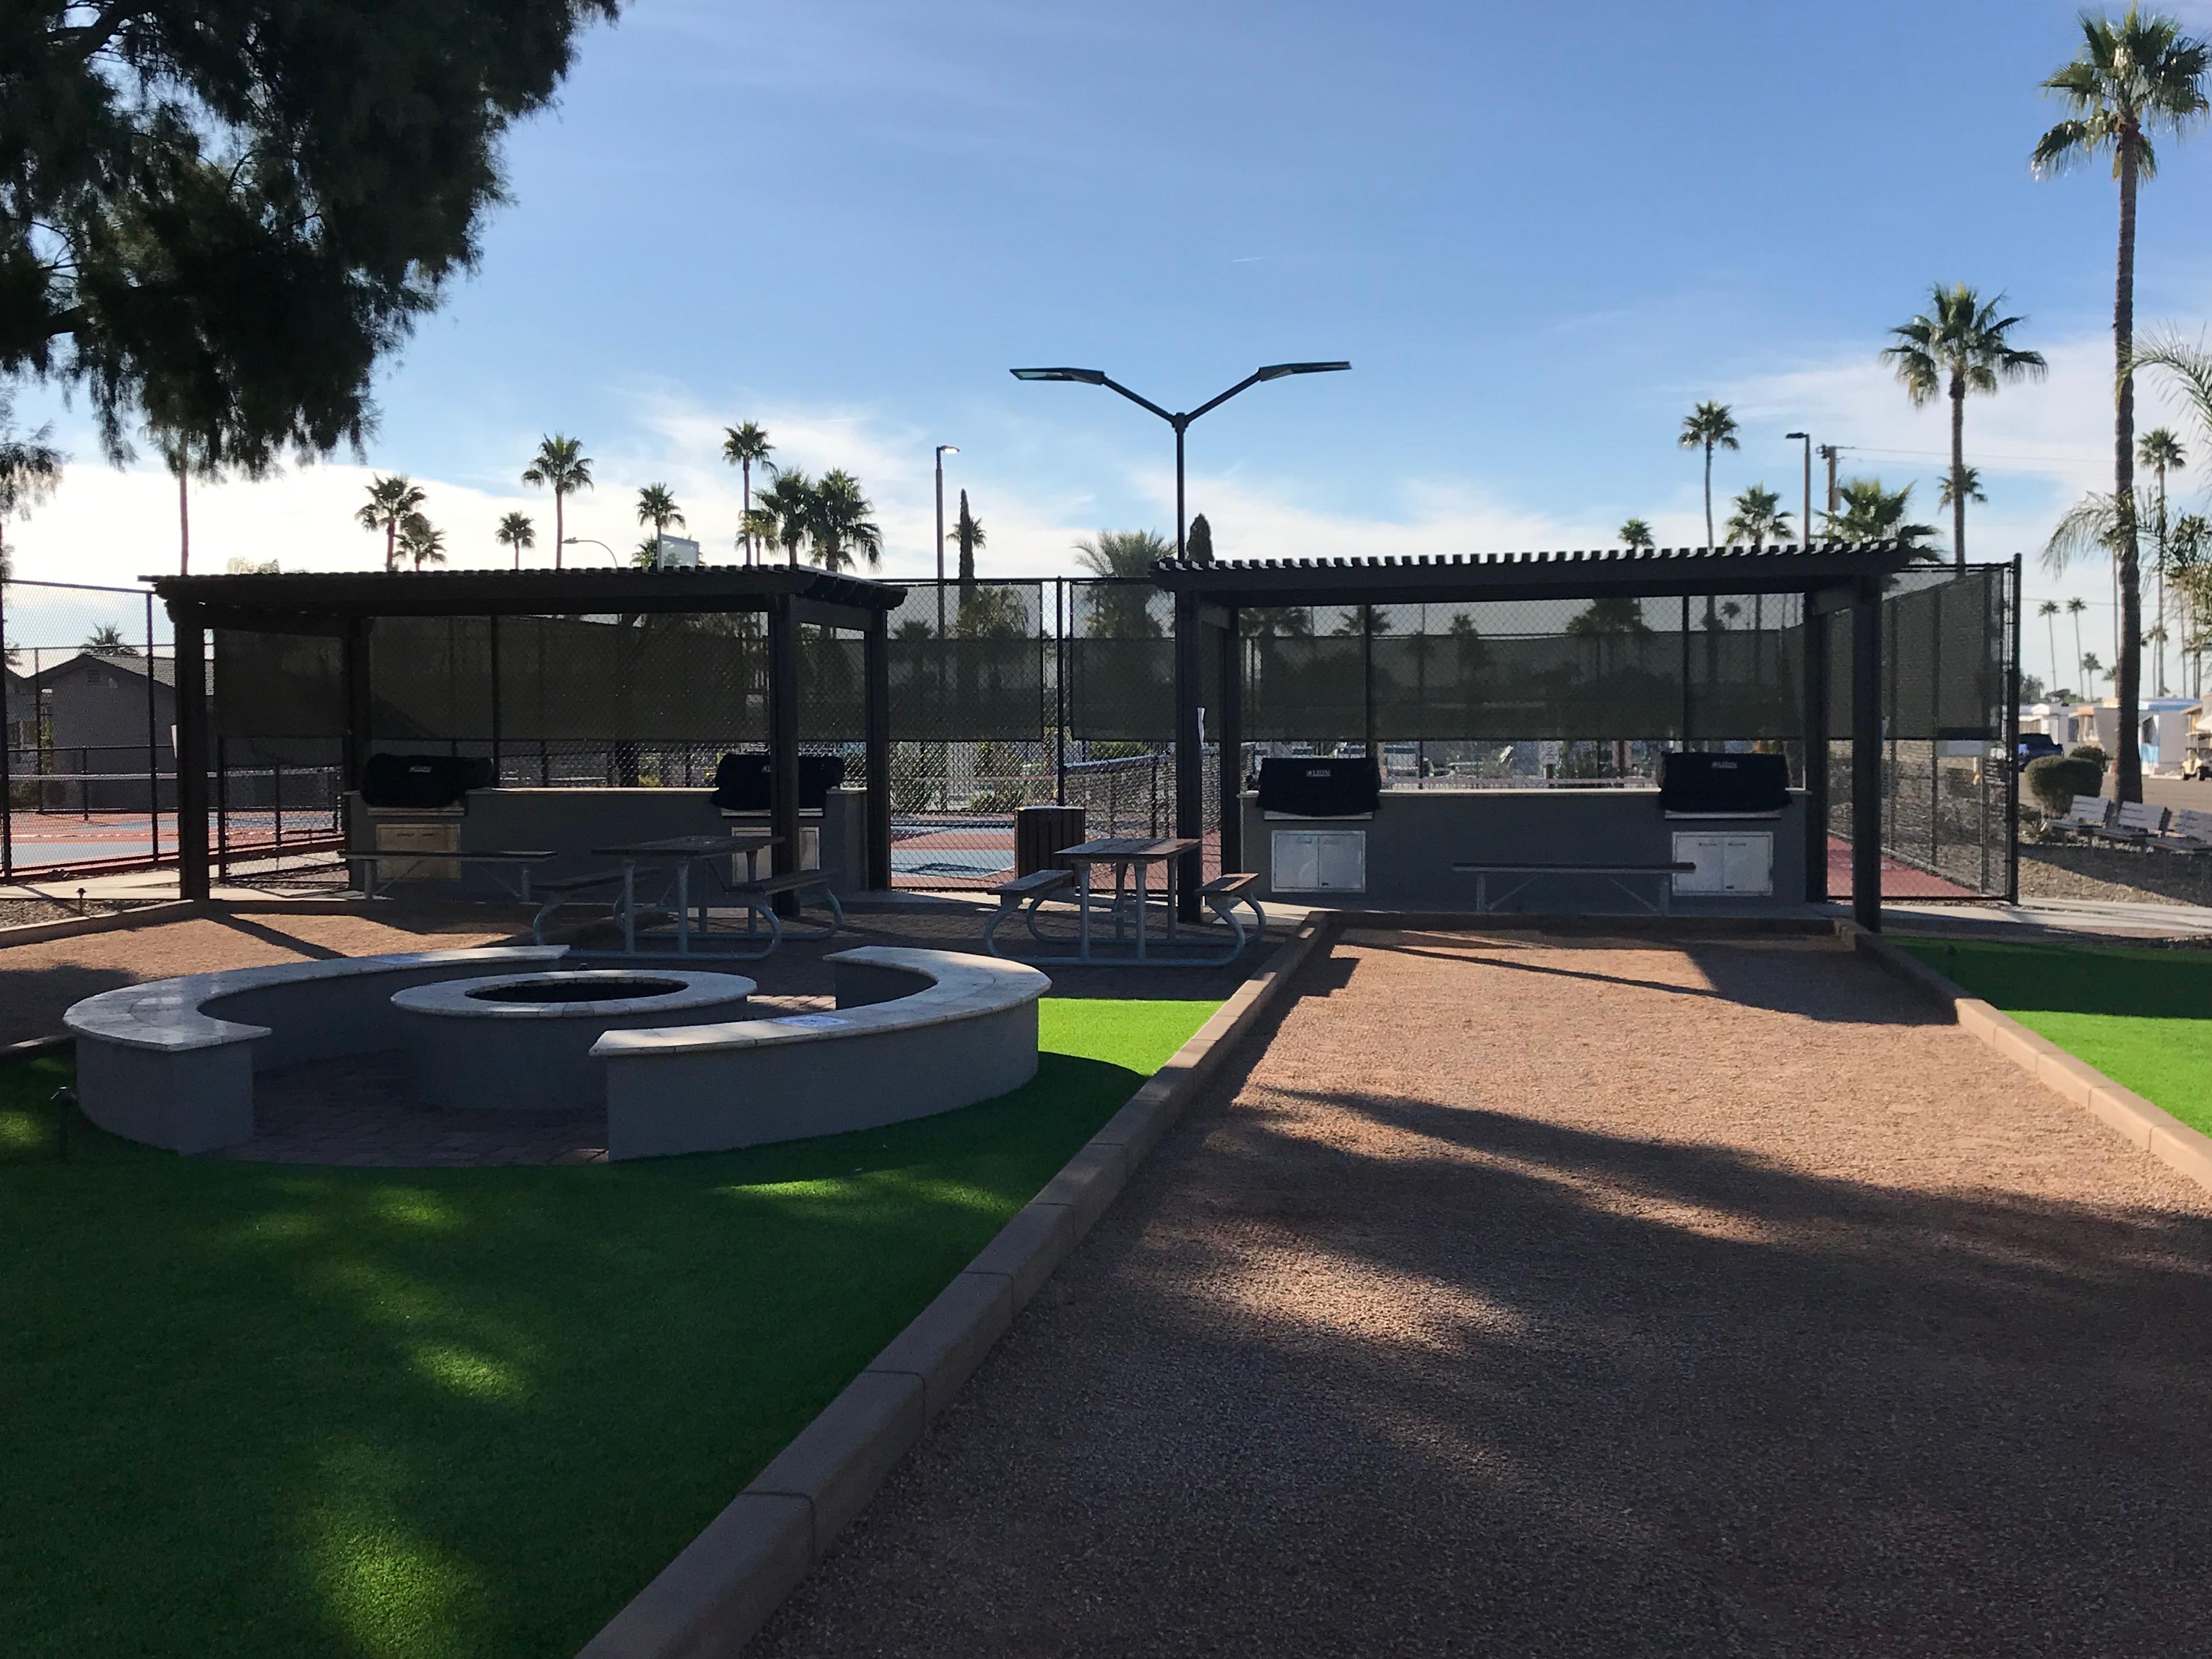 Pergola Shade Structure Park Mesa AZ